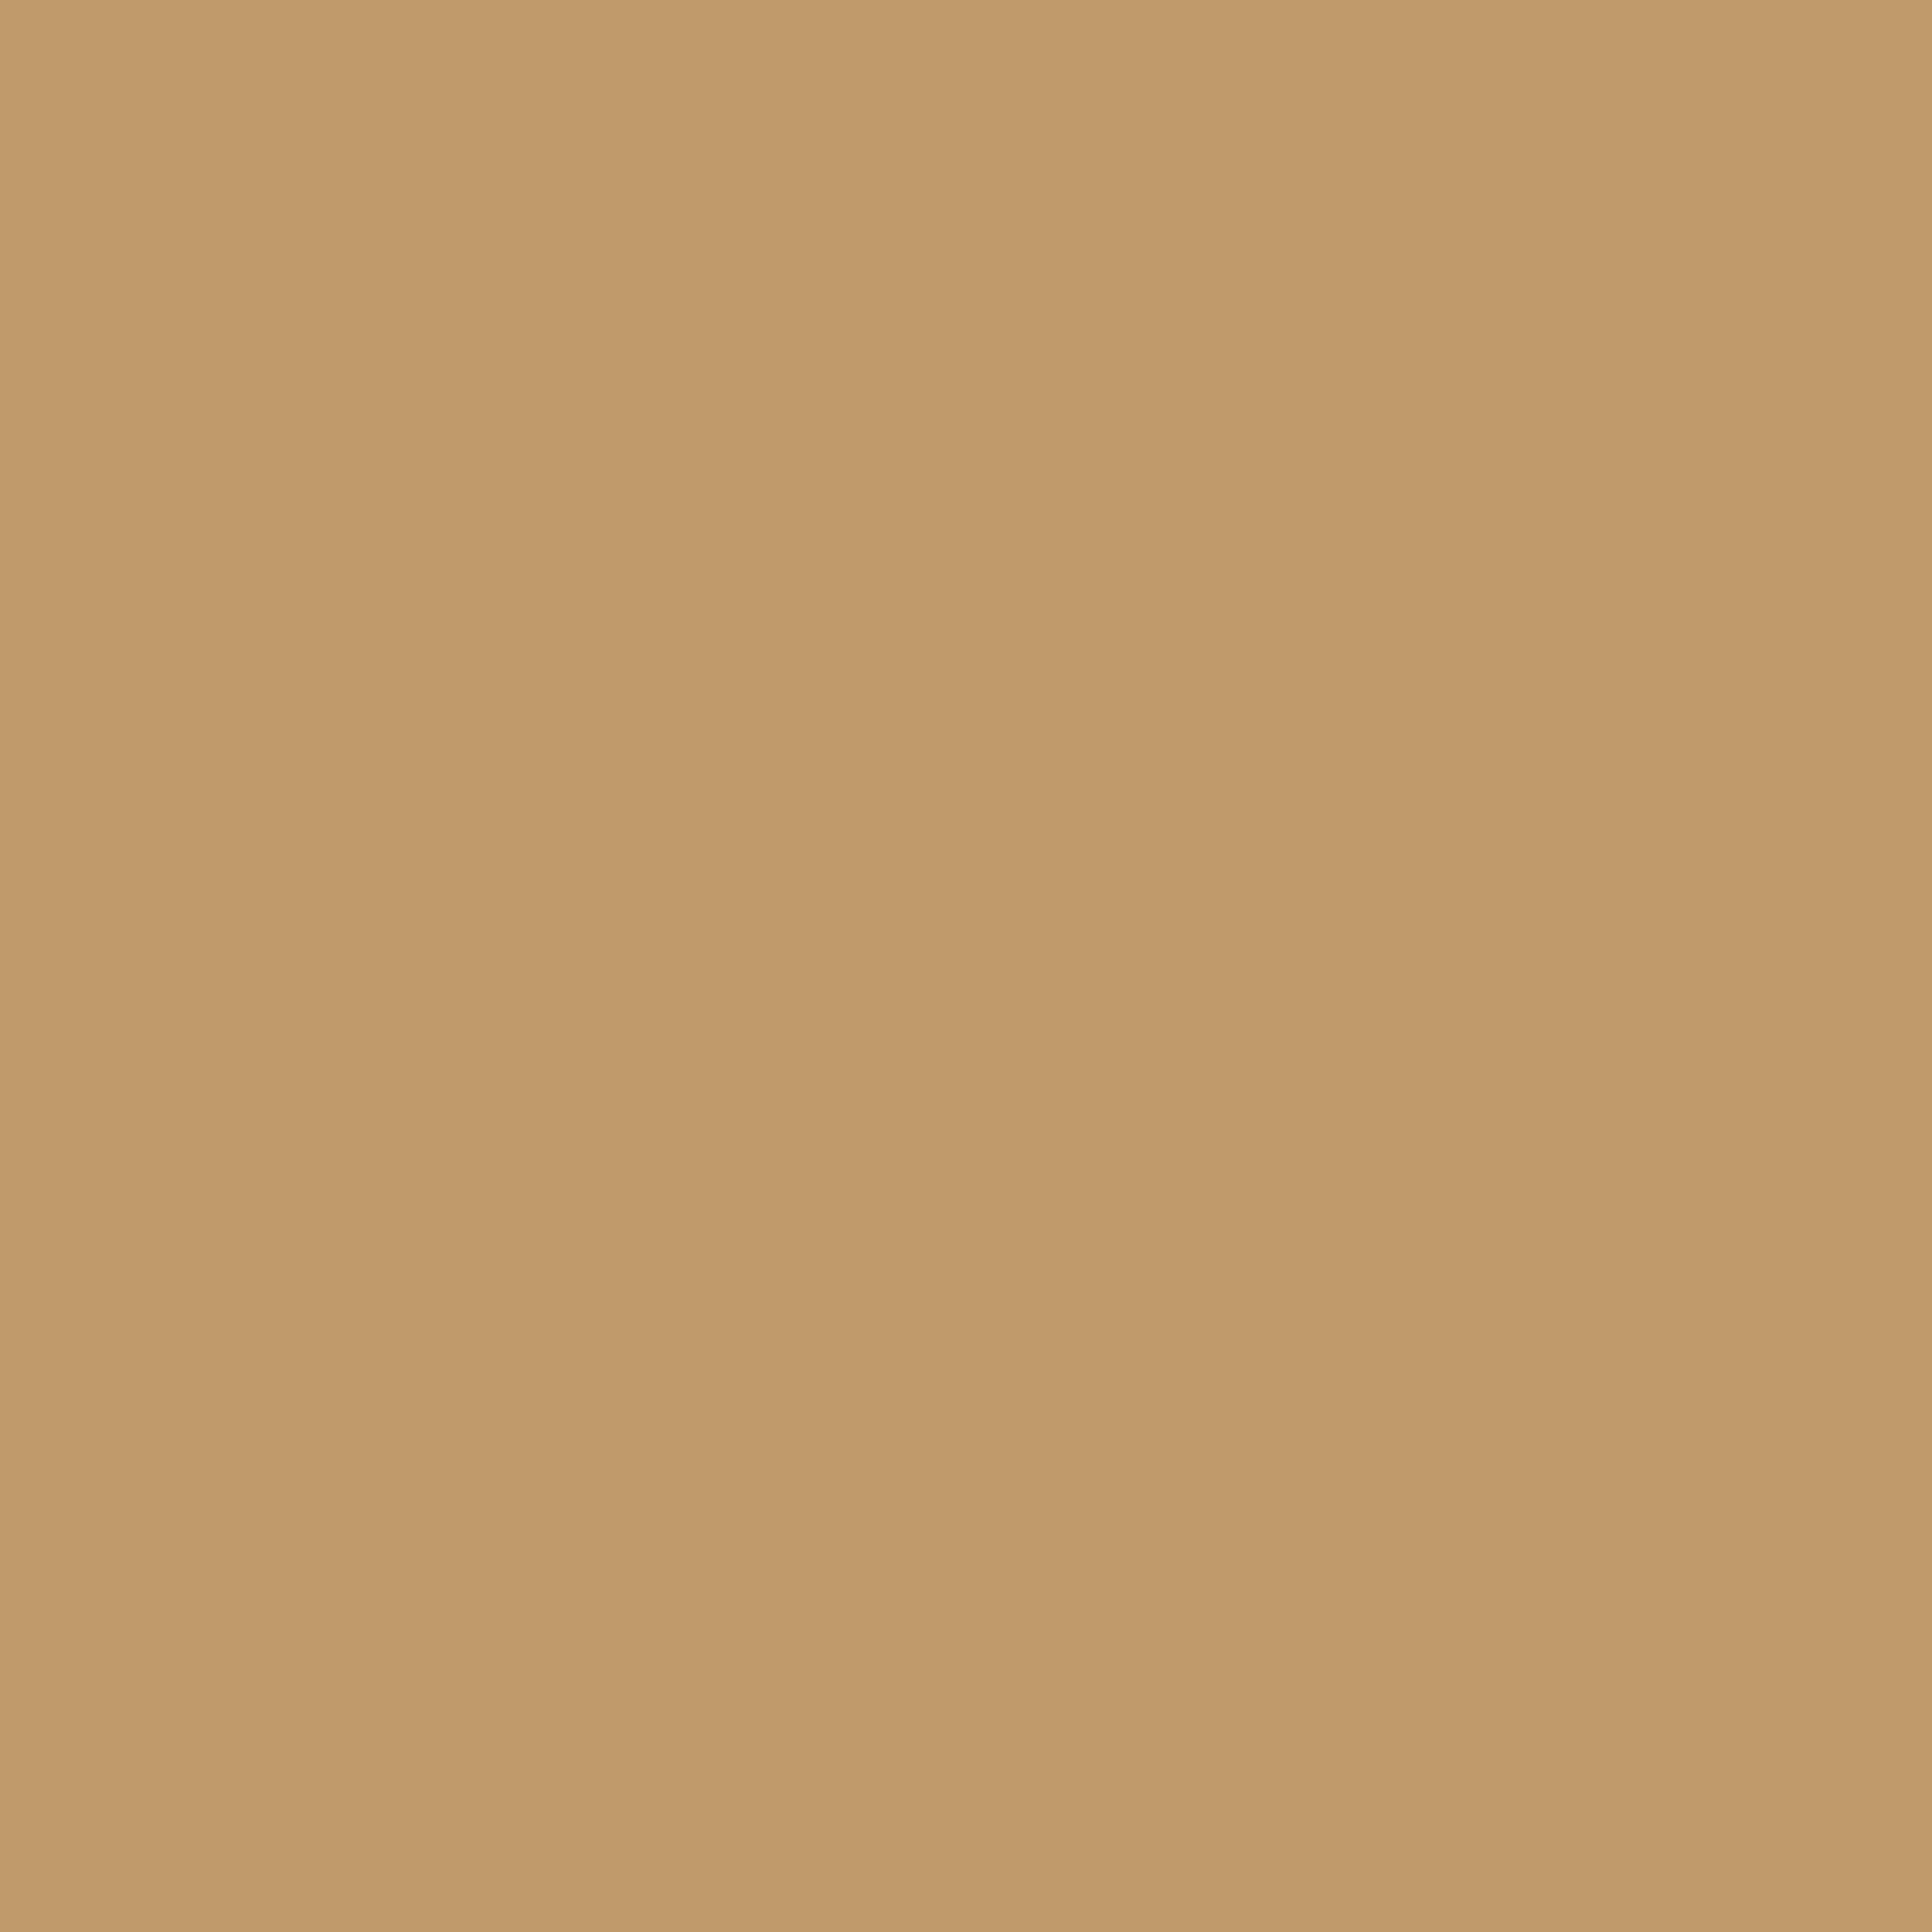 2048x2048 Desert Solid Color Background